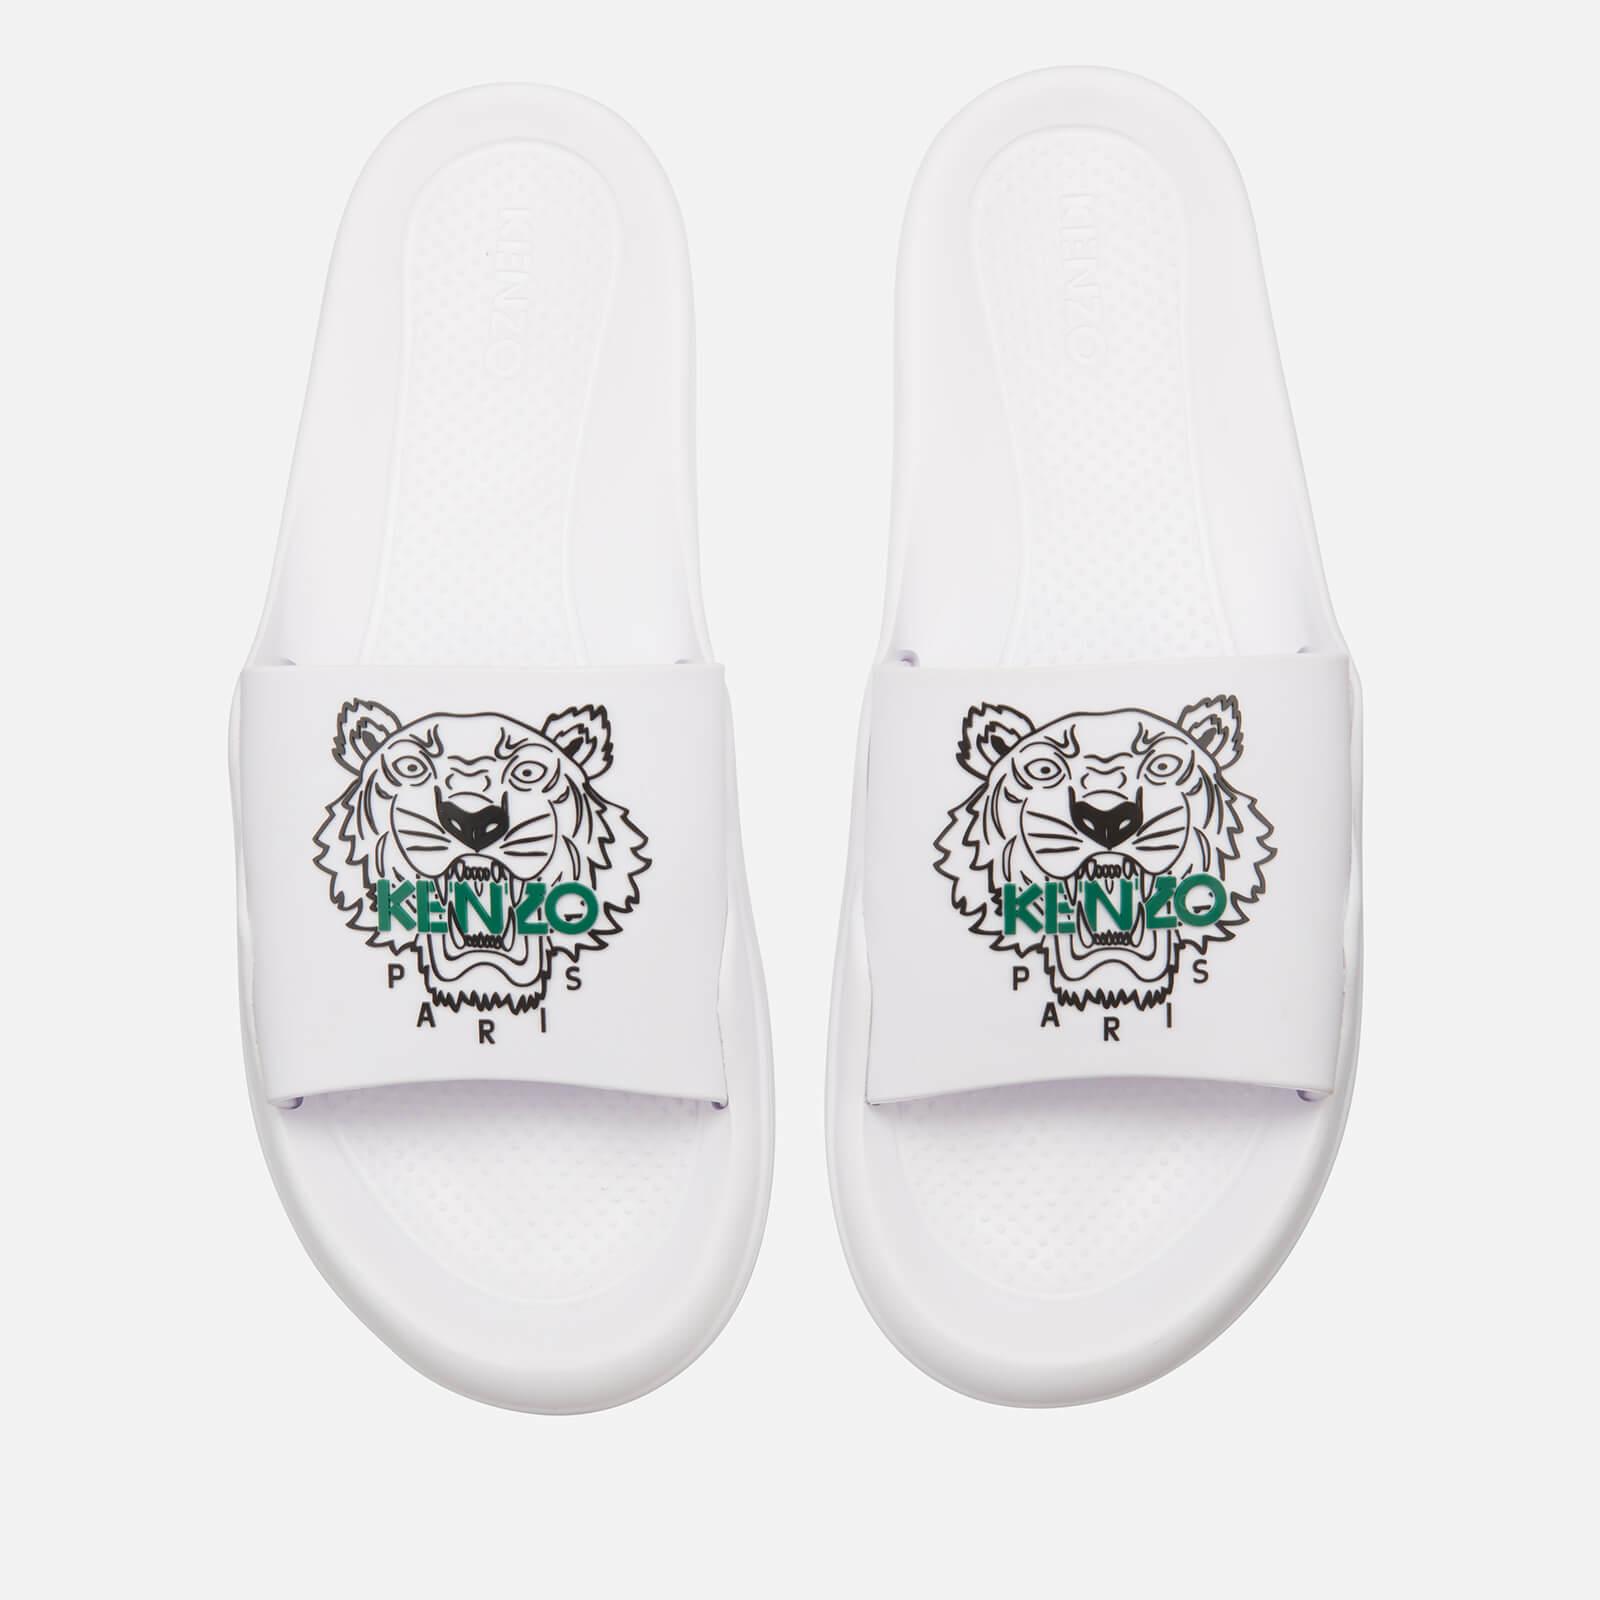 8f5bf6611 KENZO Men's Tiger Slide Sandals - White - Free UK Delivery over £50